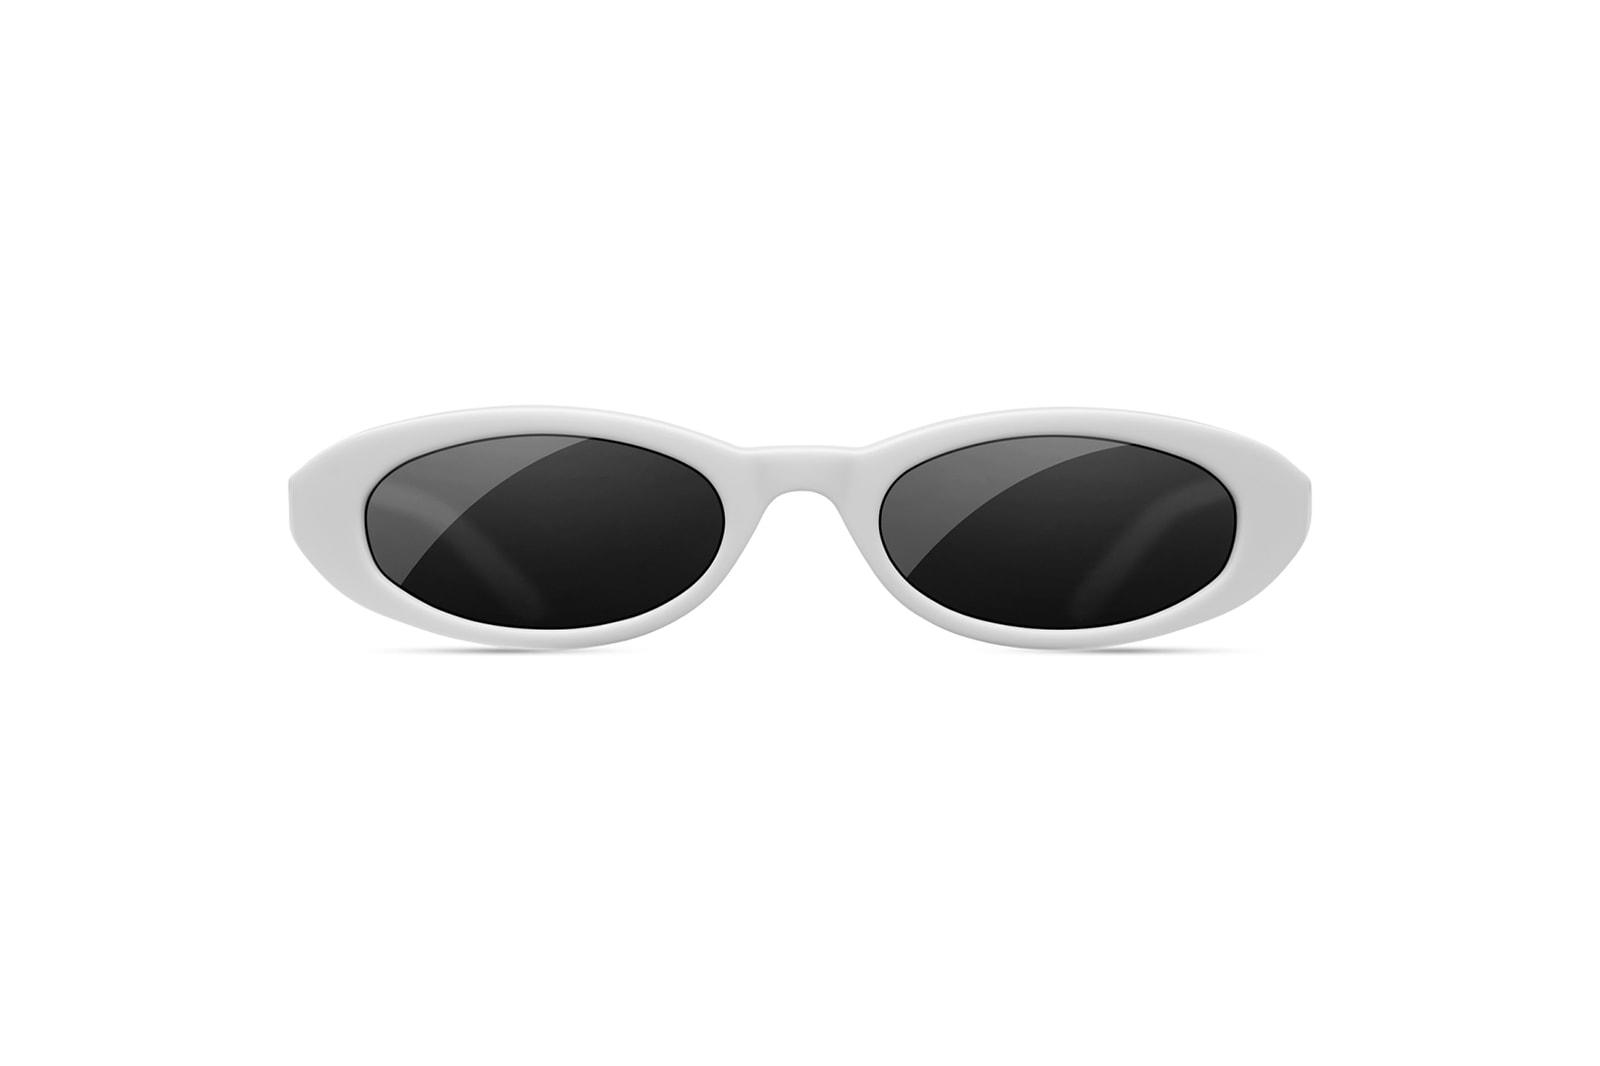 CHIMI eyewear round oval sunglasses brand mini small sci fi futuristic shades affordable stockholm label joel ighe pink white black unisex mens womens where to buy